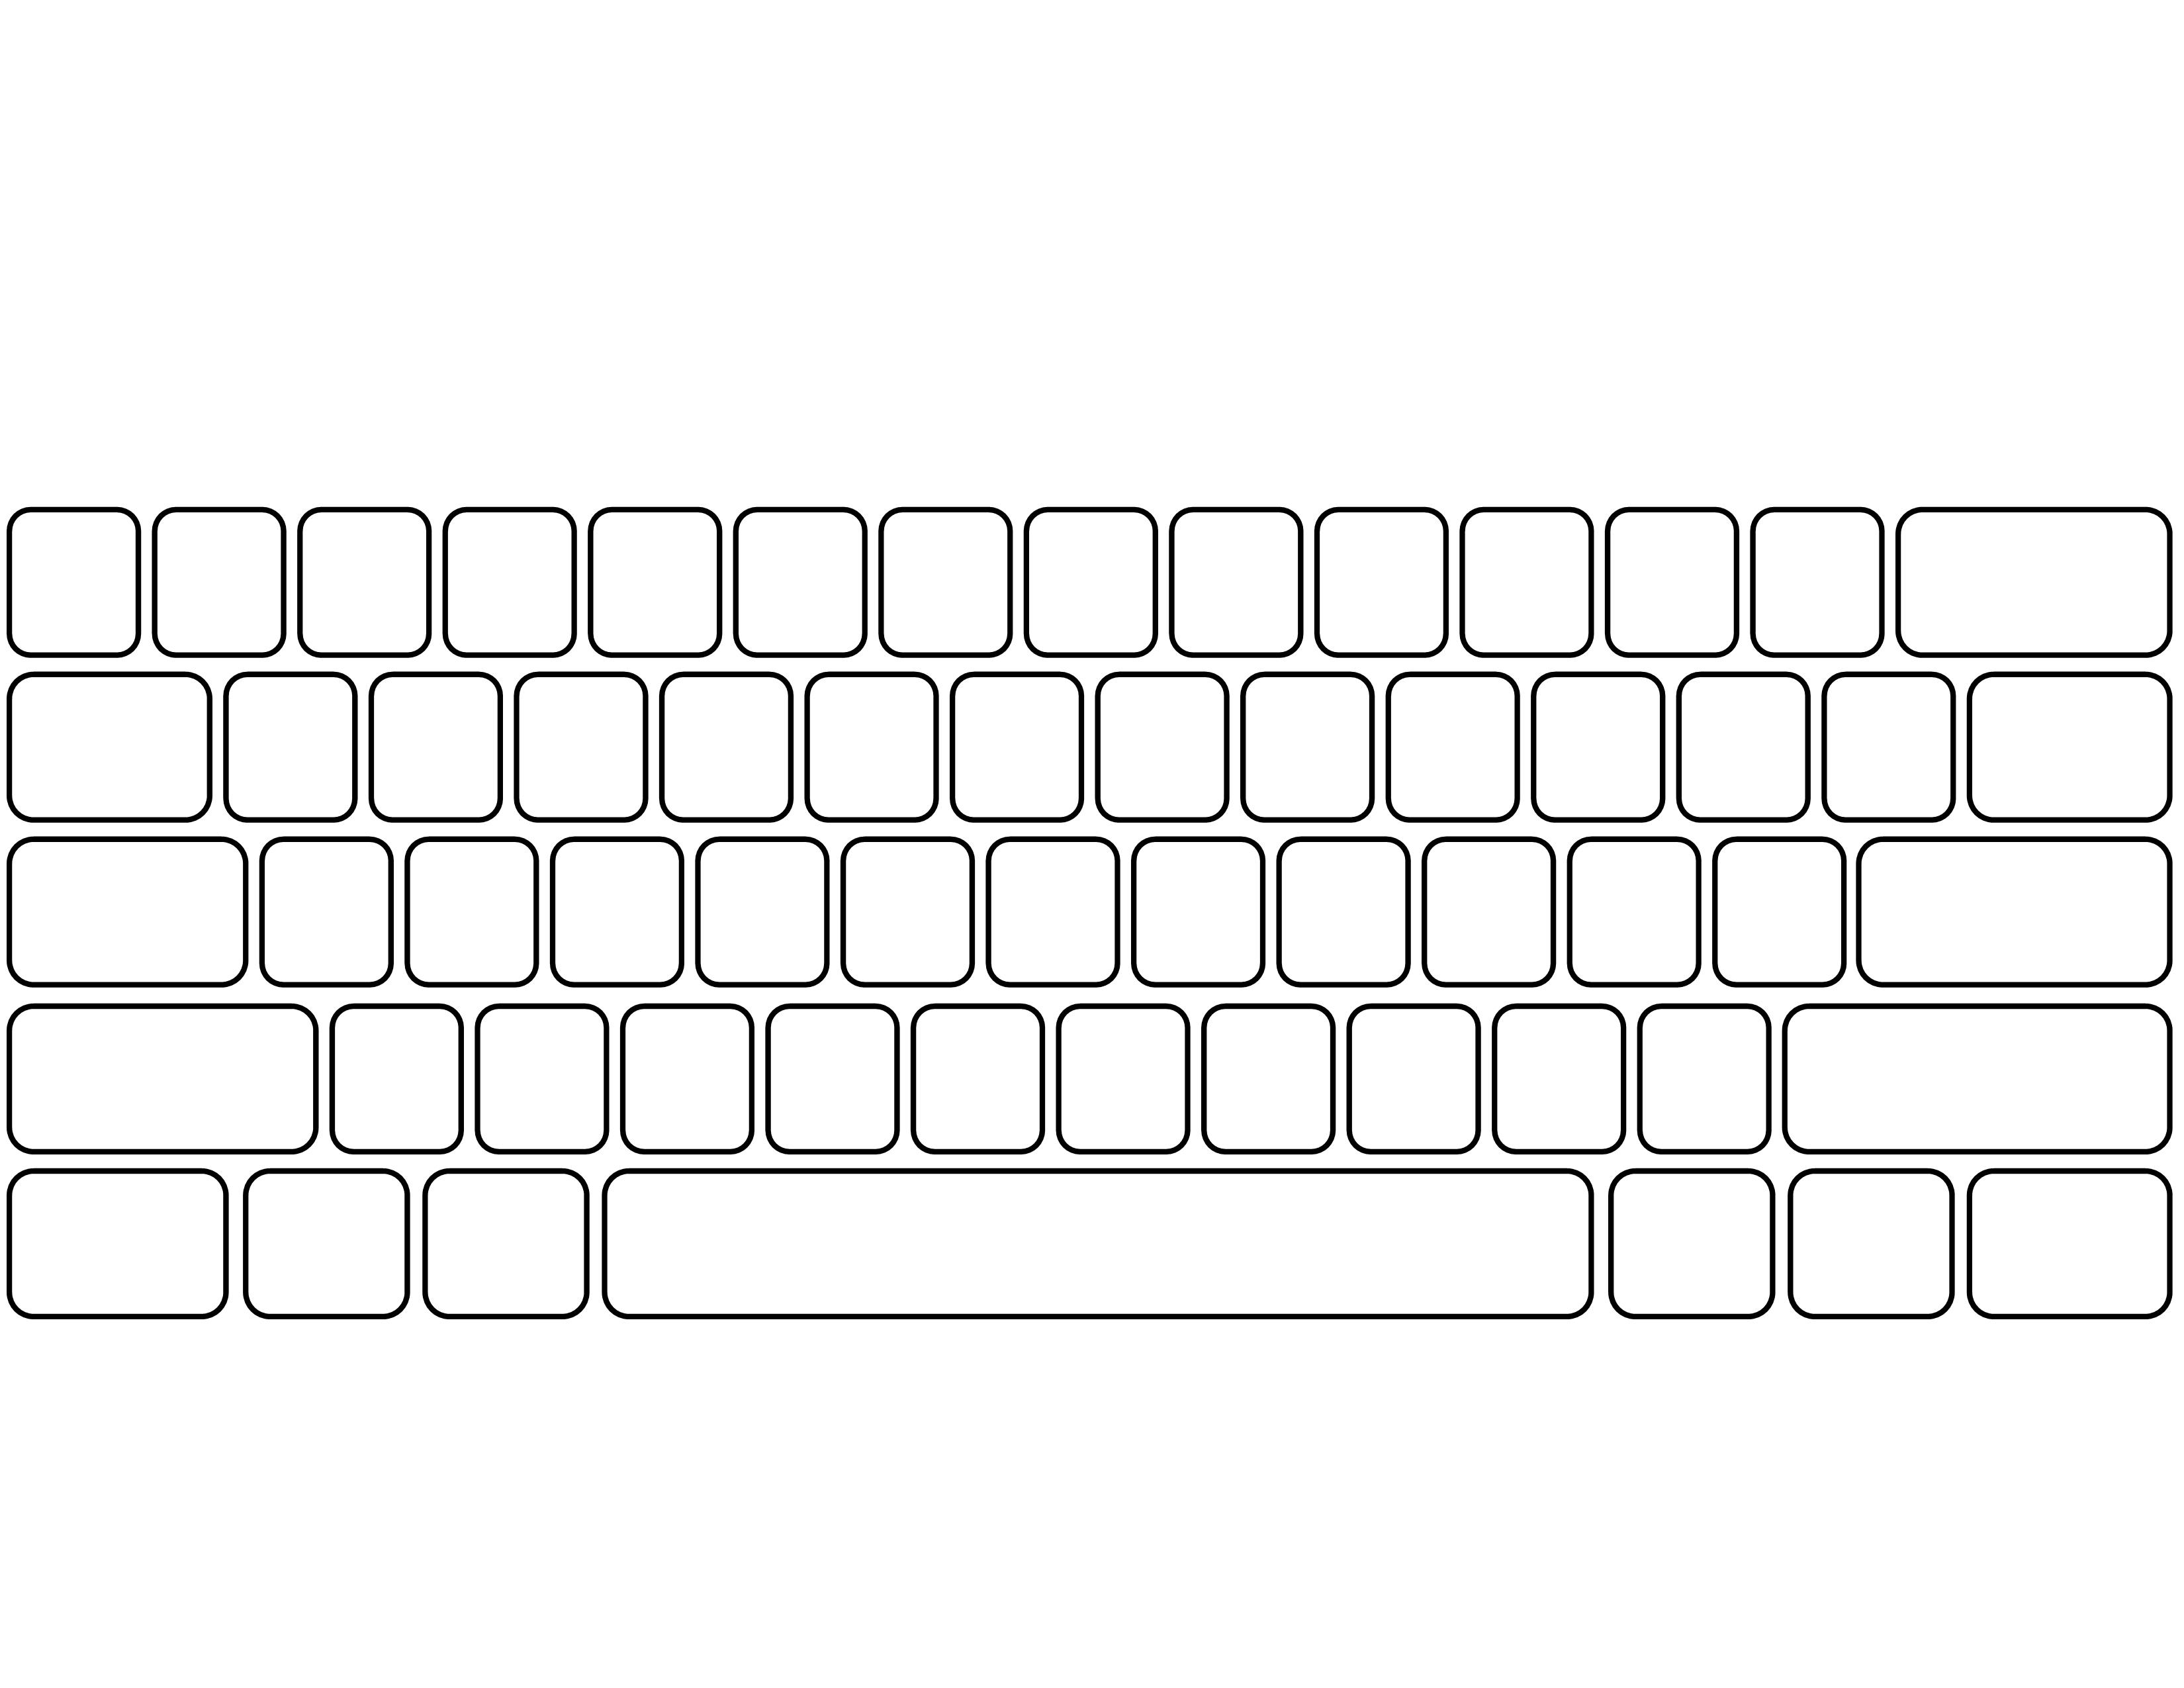 Blank Keyboard Template | Ginger's $1 Tech Shop | Computer Keyboard | Free Printable Computer Keyboarding Worksheets